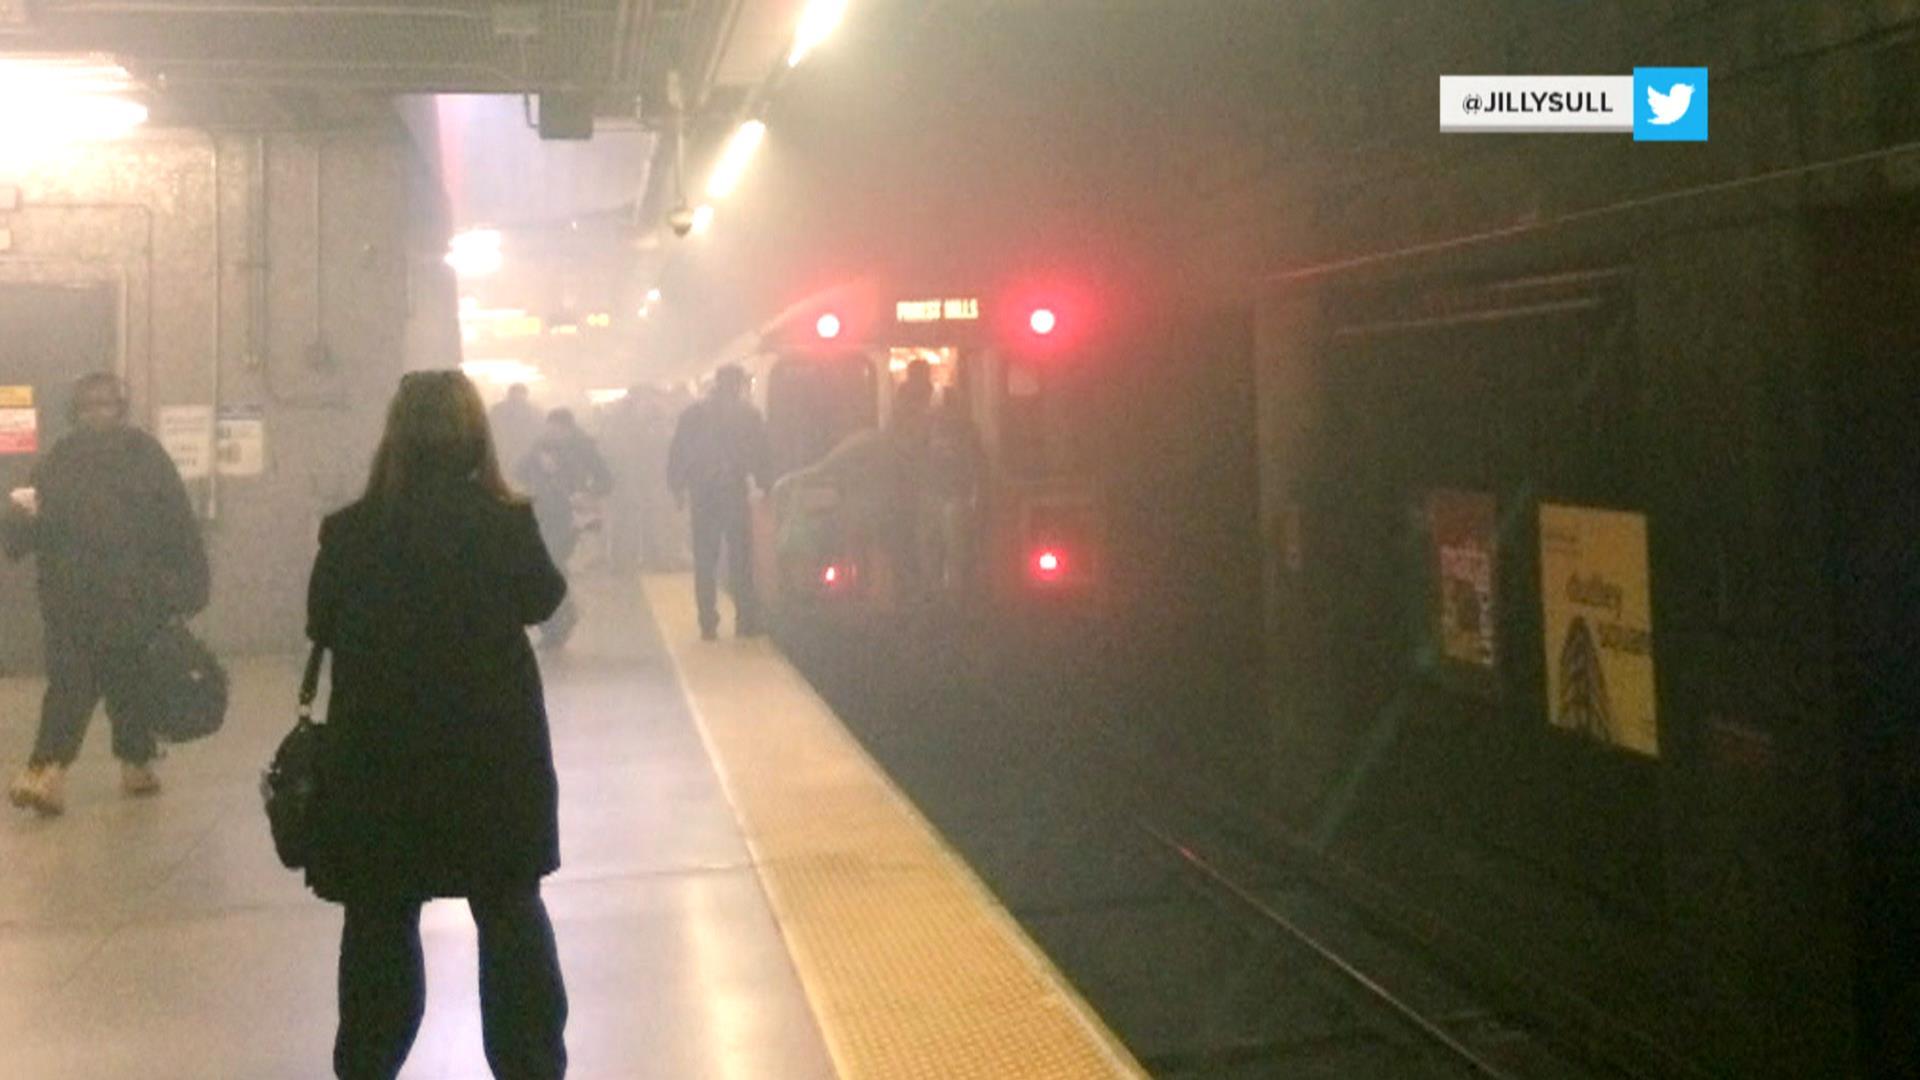 Boston subway train fills with smoke; commuter describes smashing window to escape